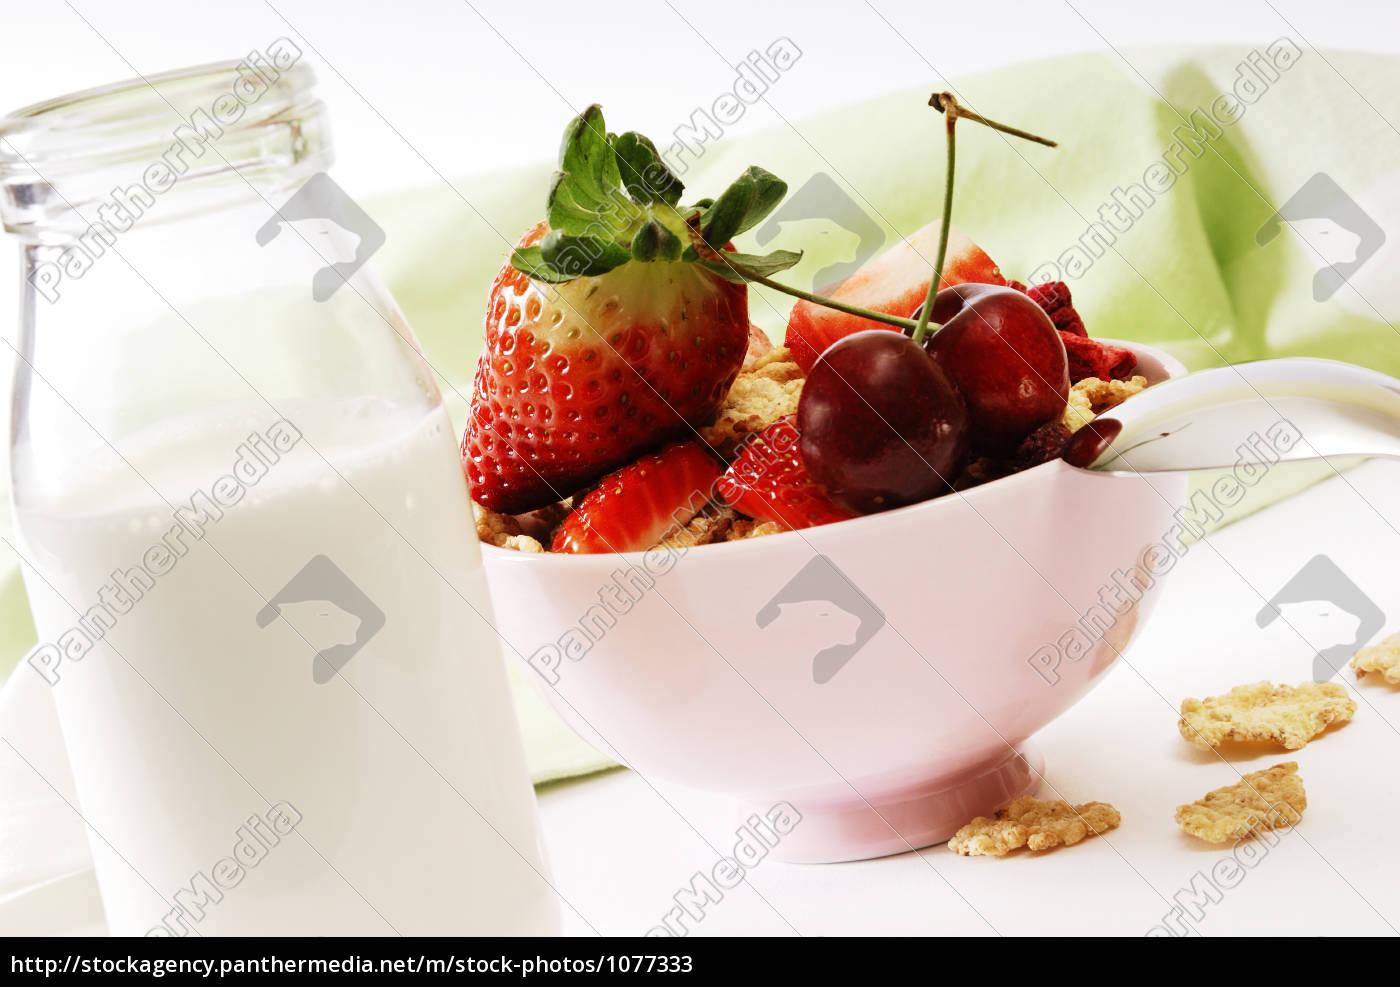 sund, morgenmad - 1077333